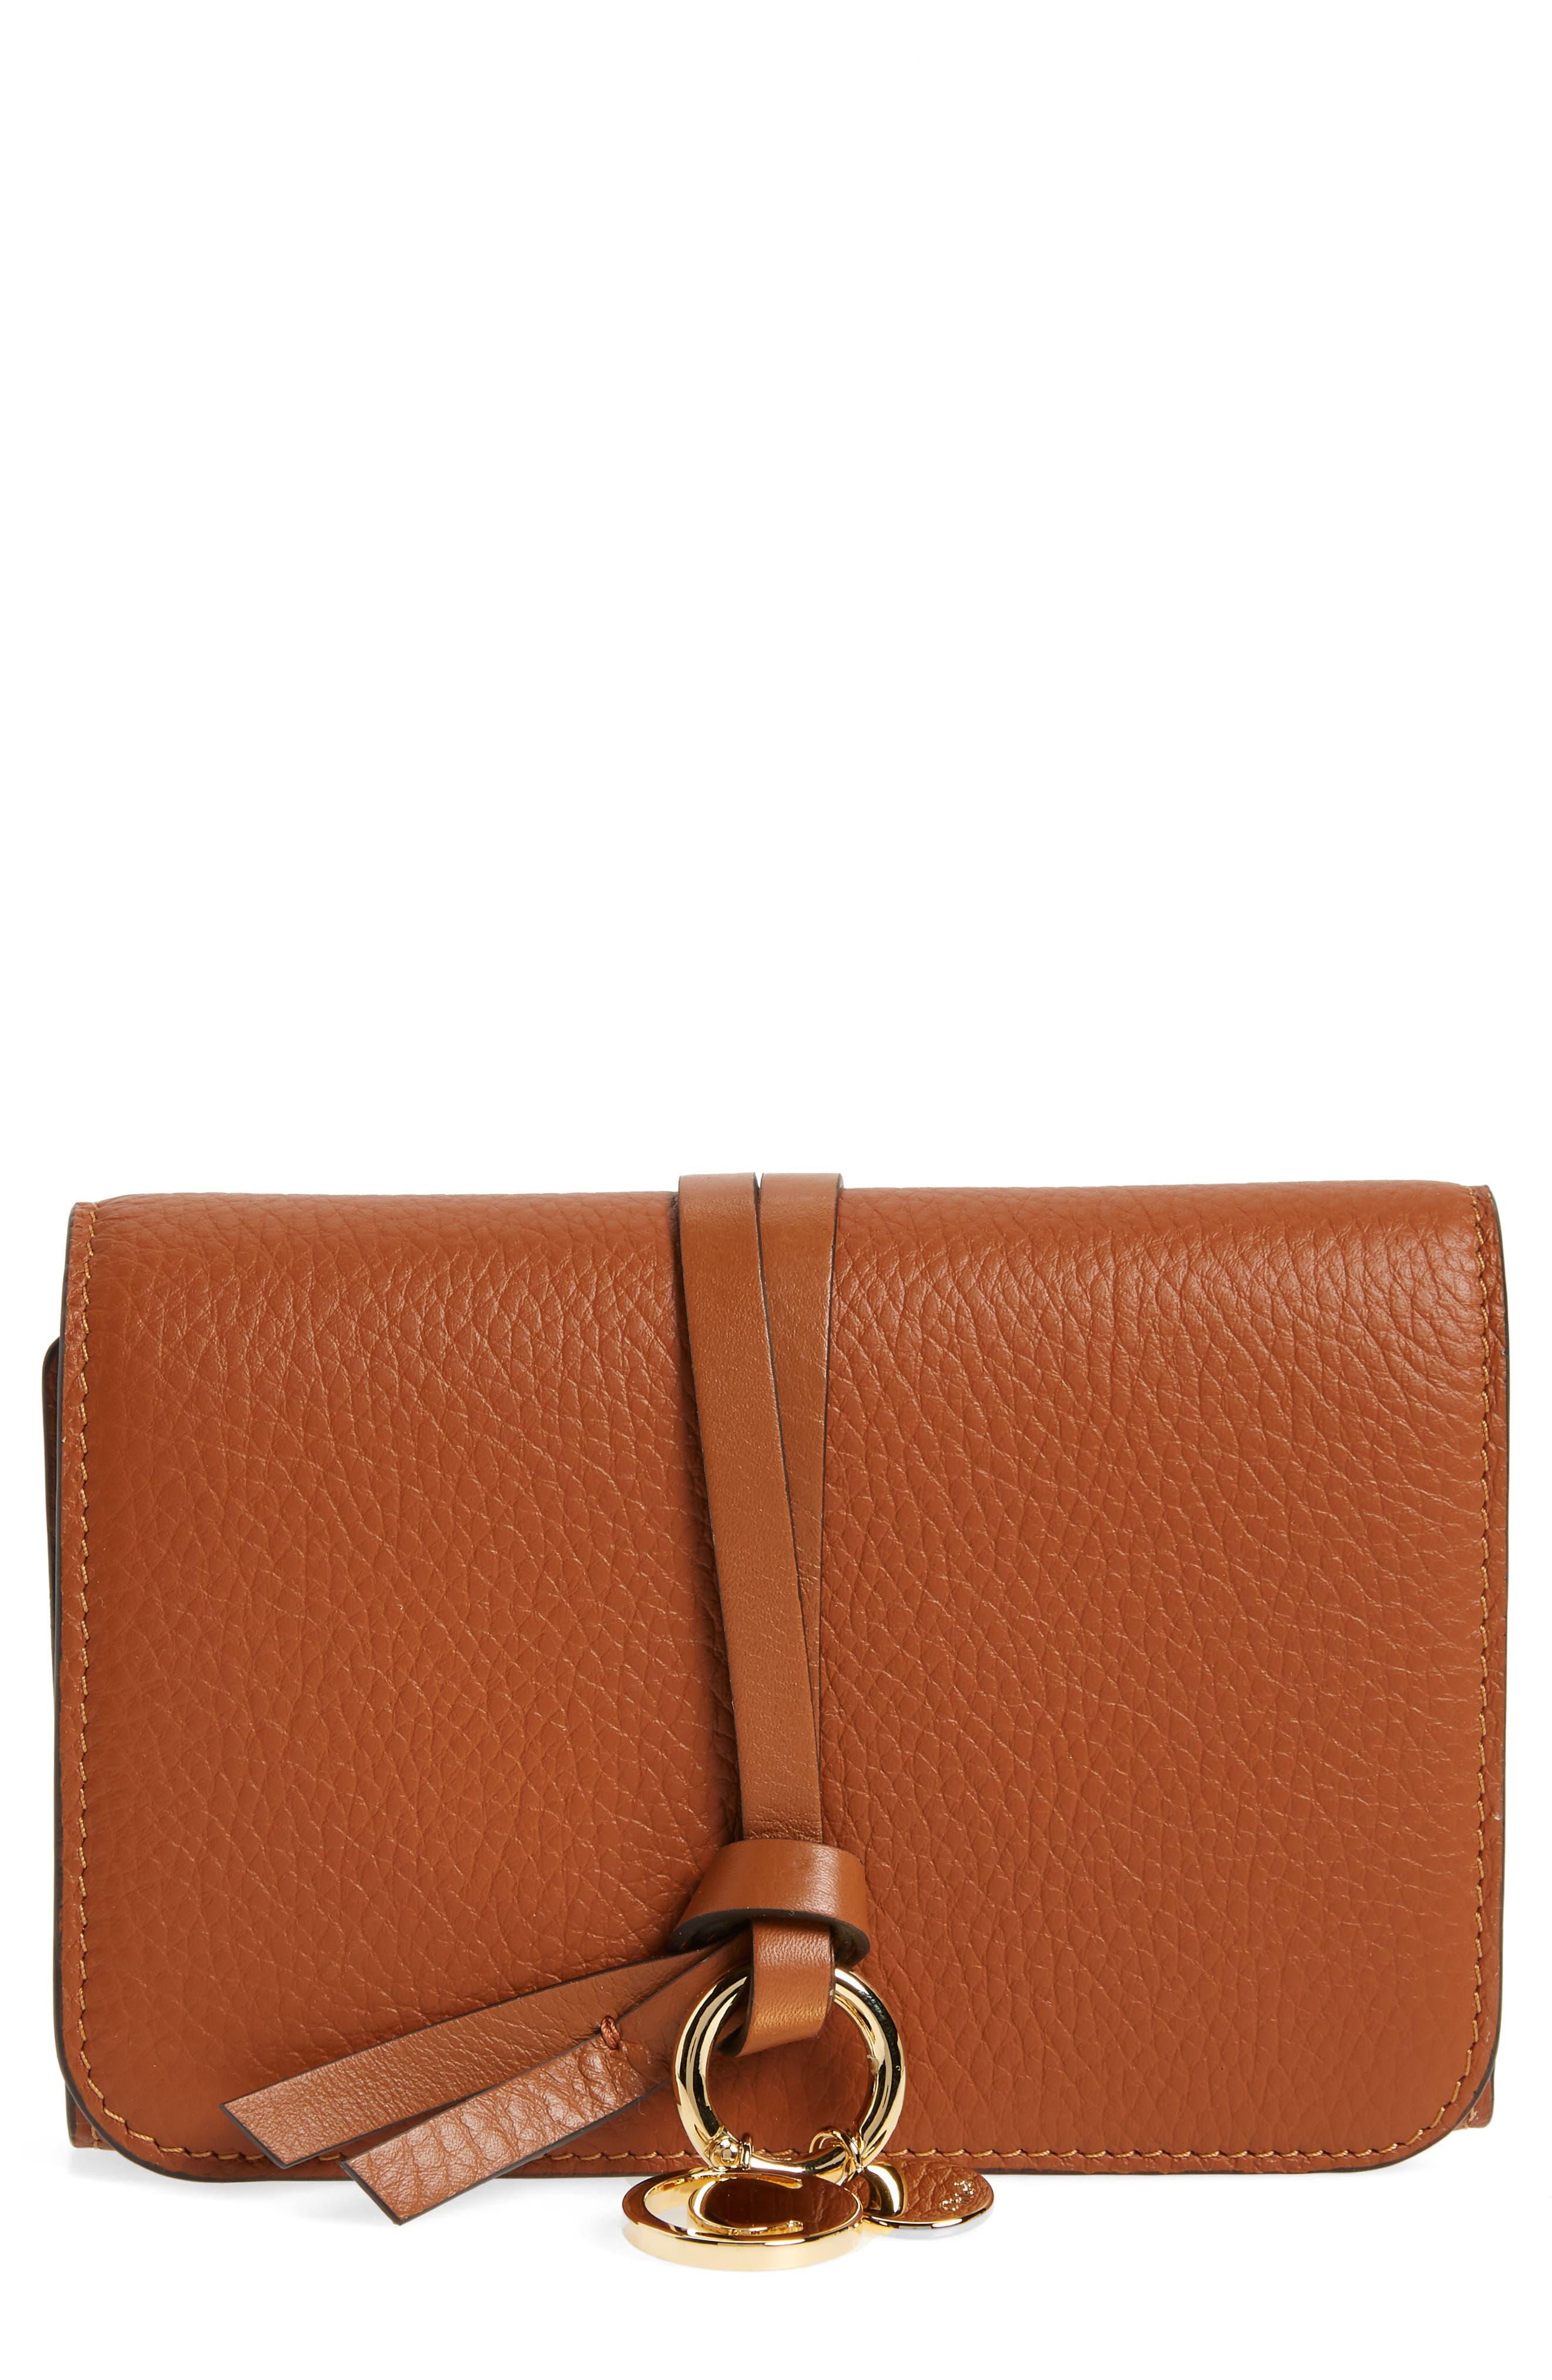 Alphabet Leather Wallet,                             Main thumbnail 1, color,                             TAN